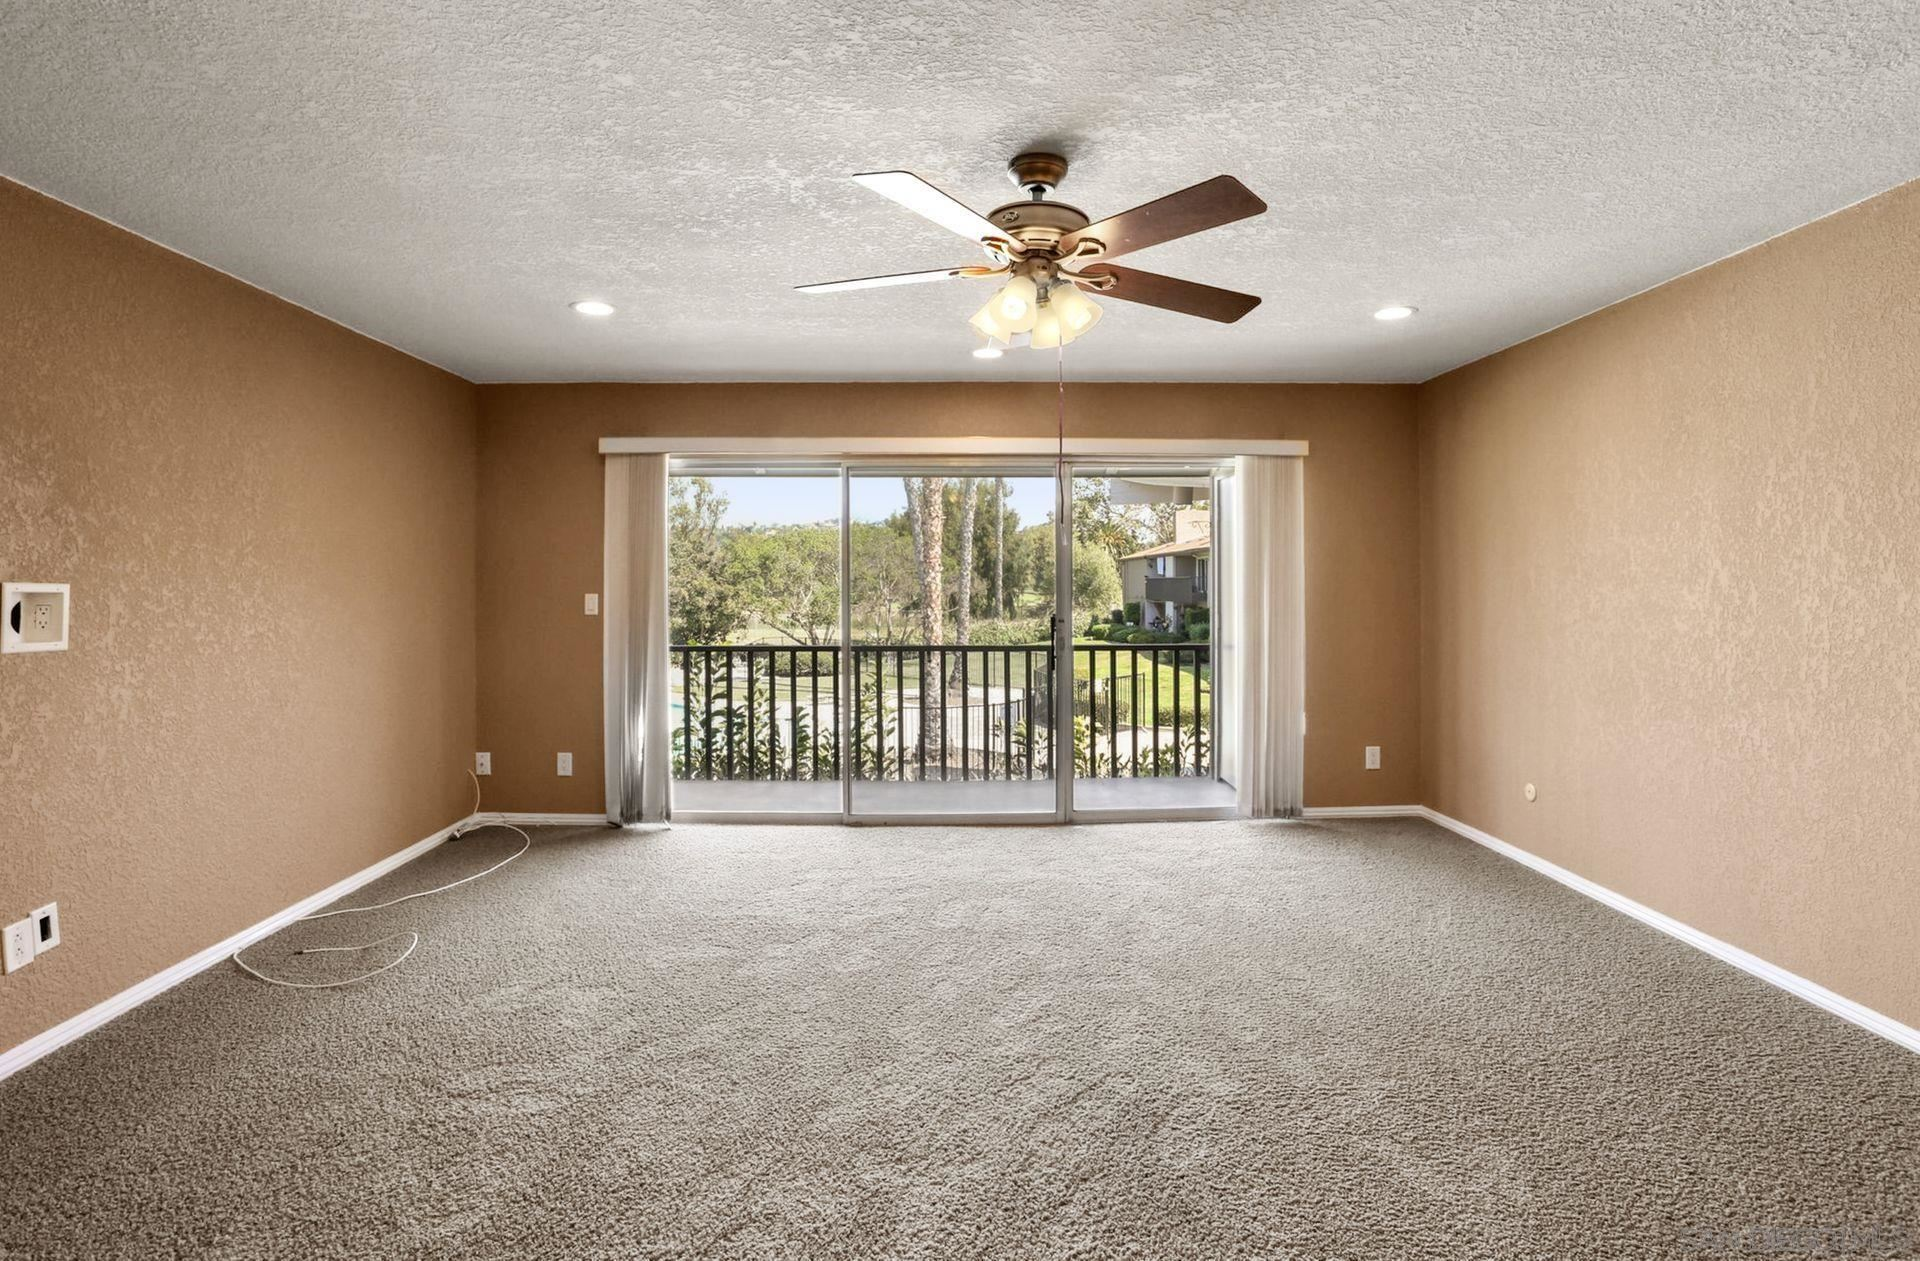 Photo of 4201 Bonita Rd #243, Bonita, CA 91902 (MLS # 210026637)